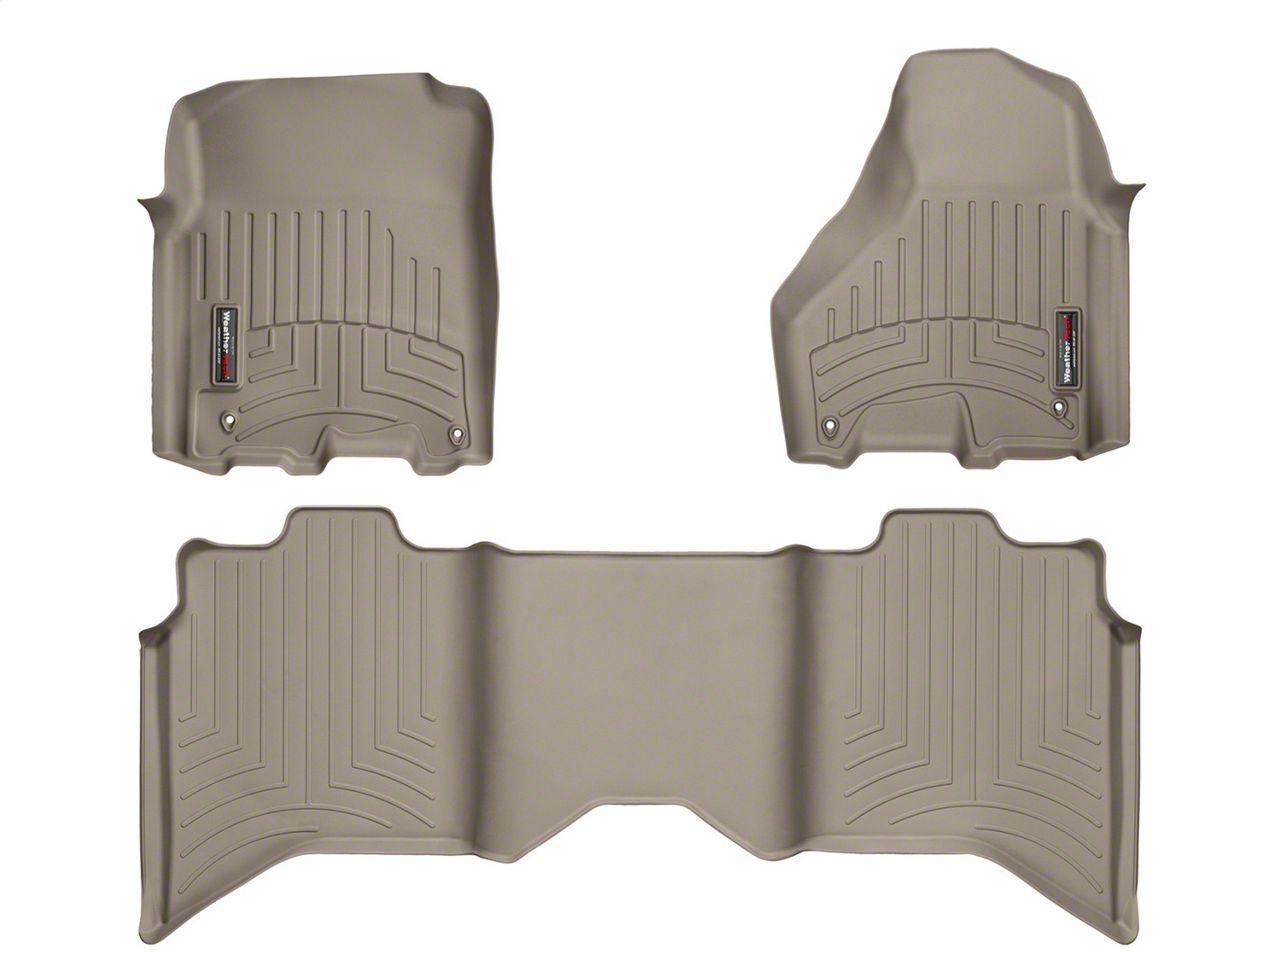 Weathertech DigitalFit Front & Rear Floor Liners - Tan (09-18 RAM 1500 Crew Cab)